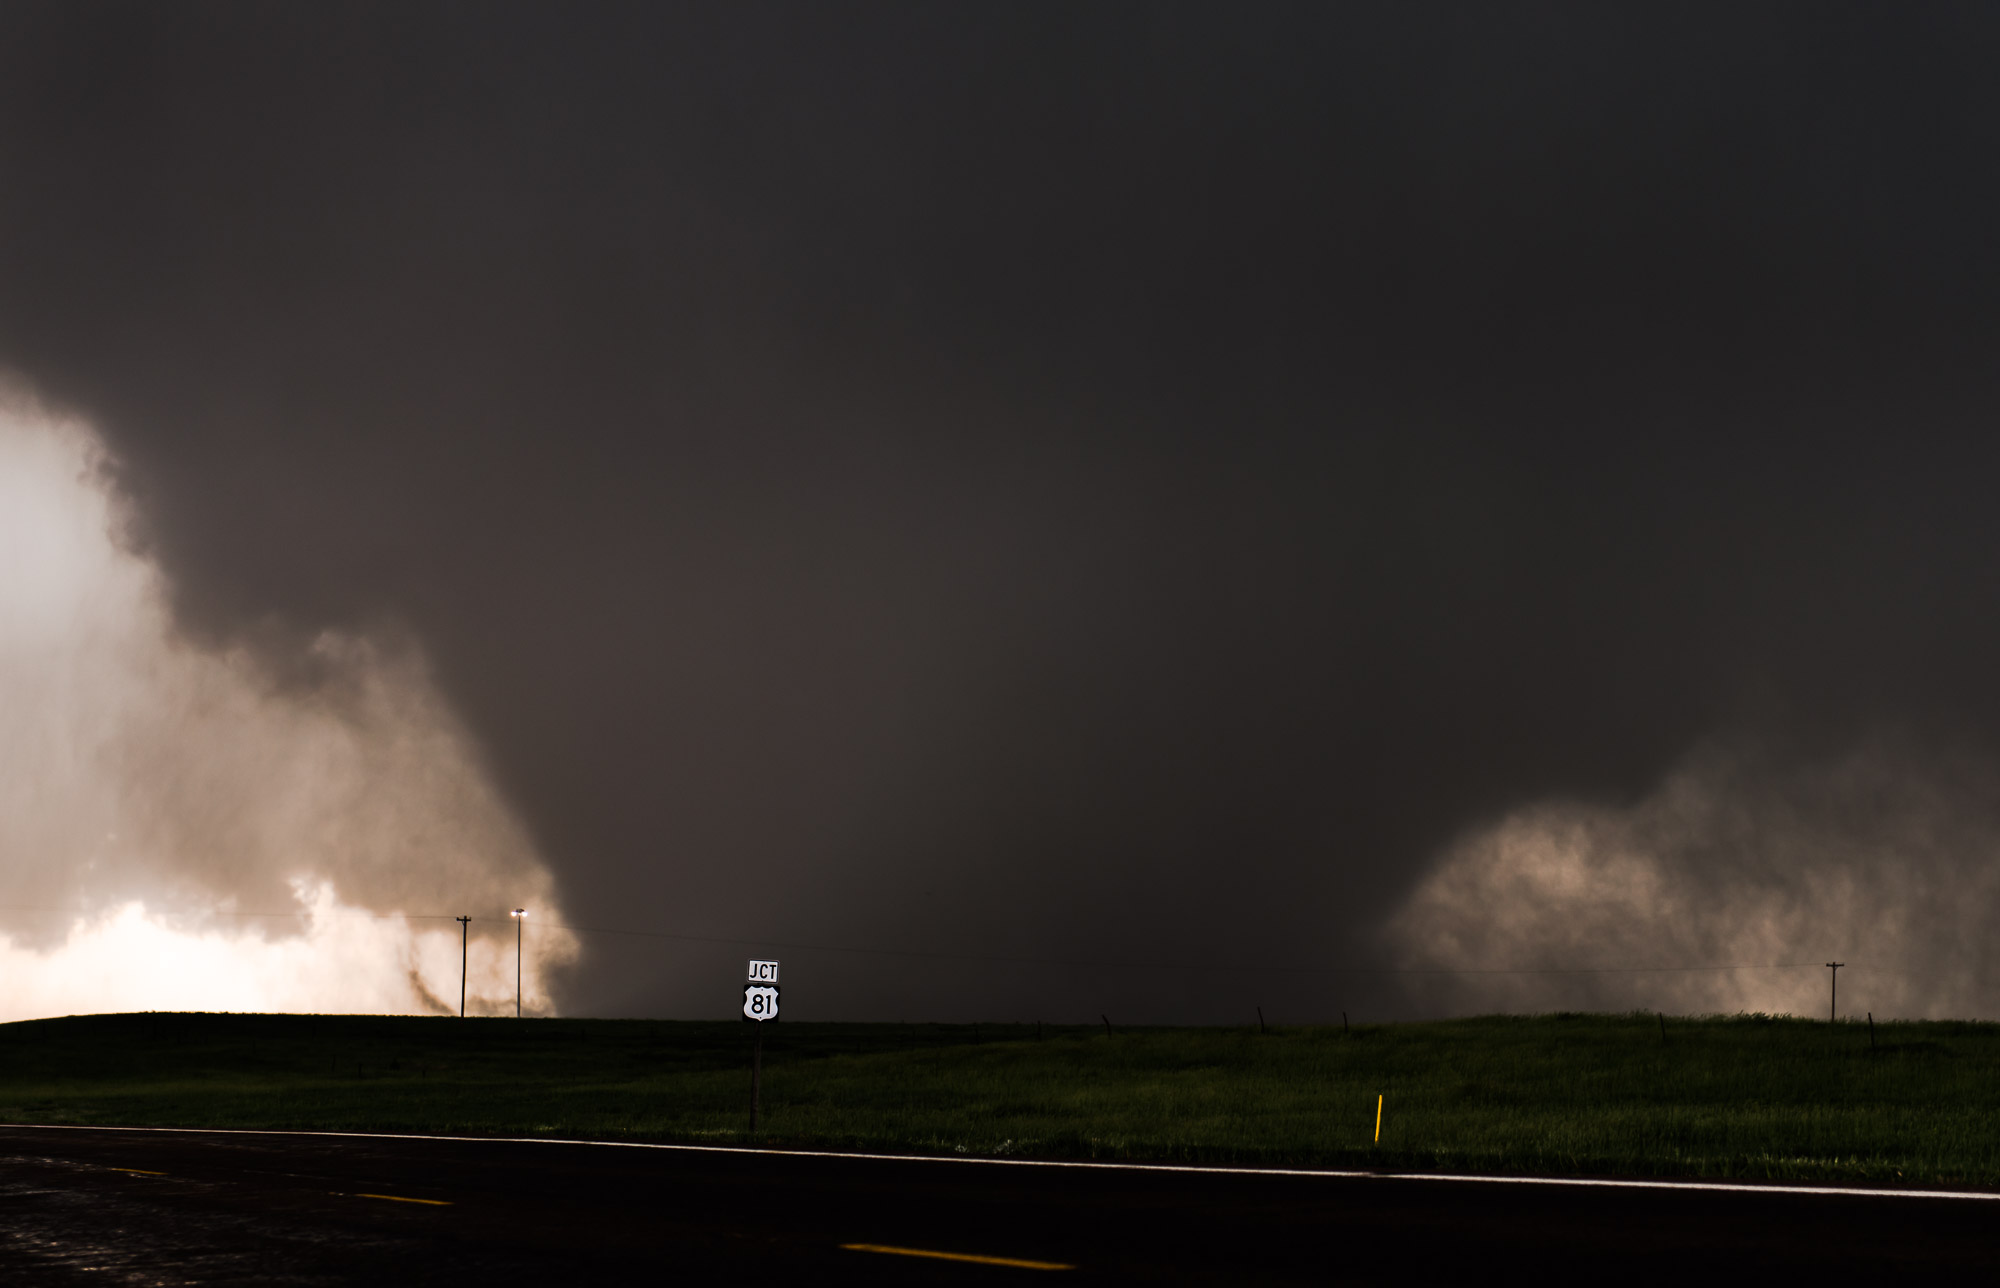 Wedge Tornado Wedge tornado - benningtonWedge Tornado